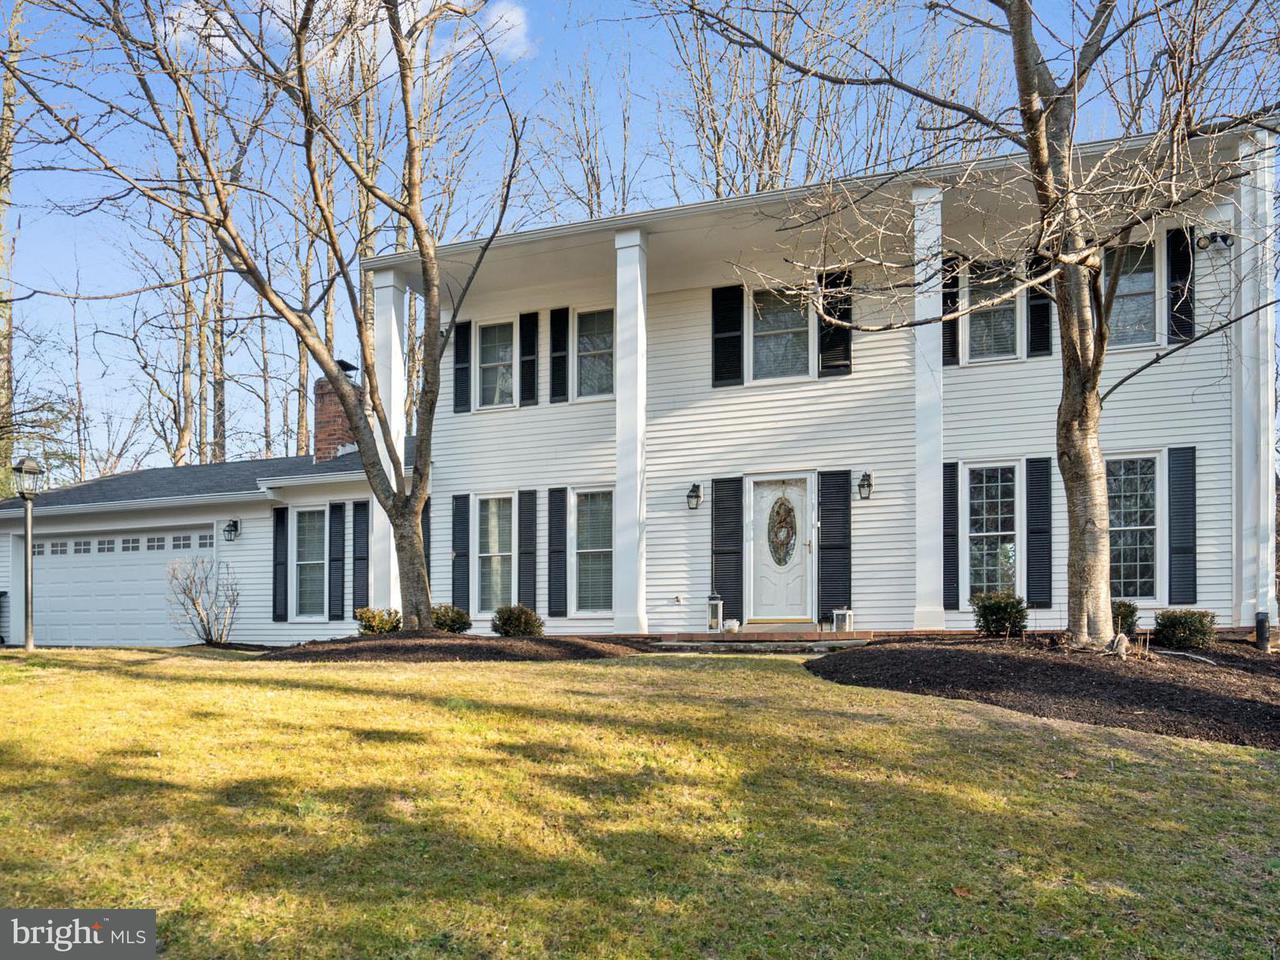 Single Family Home for Sale at 11710 Ayreshire Road 11710 Ayreshire Road Oakton, Virginia 22124 United States